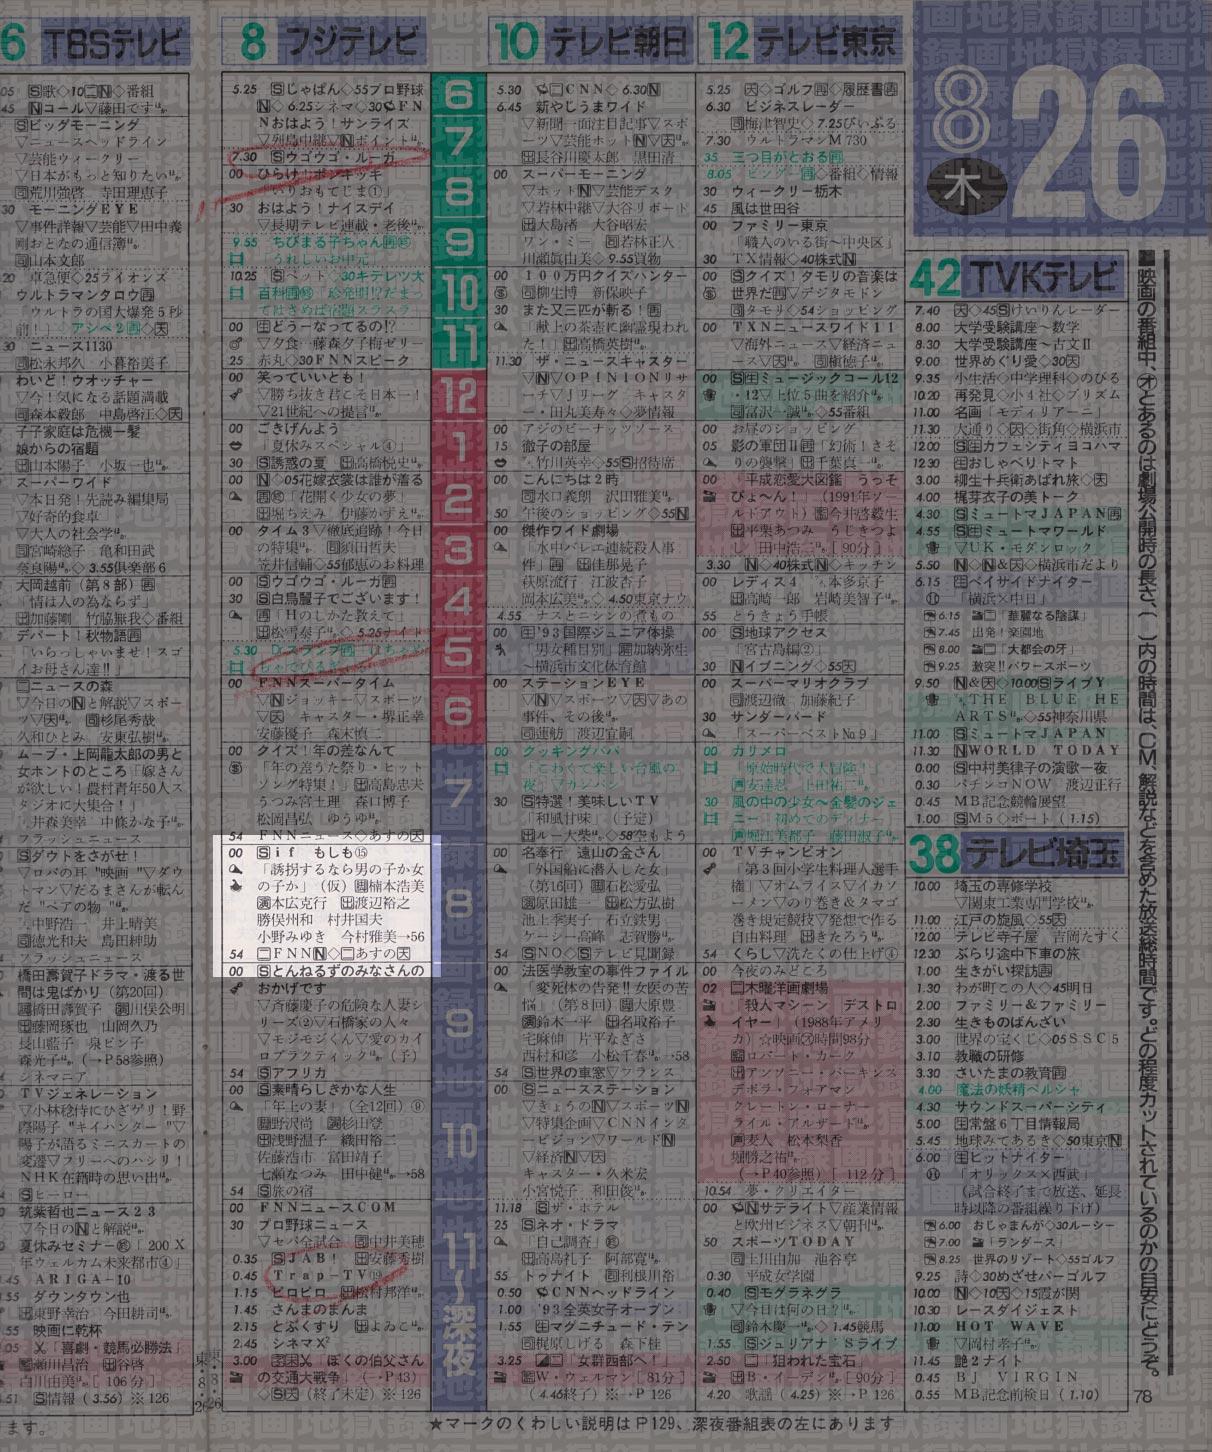 1993-08-26-telepal.jpg